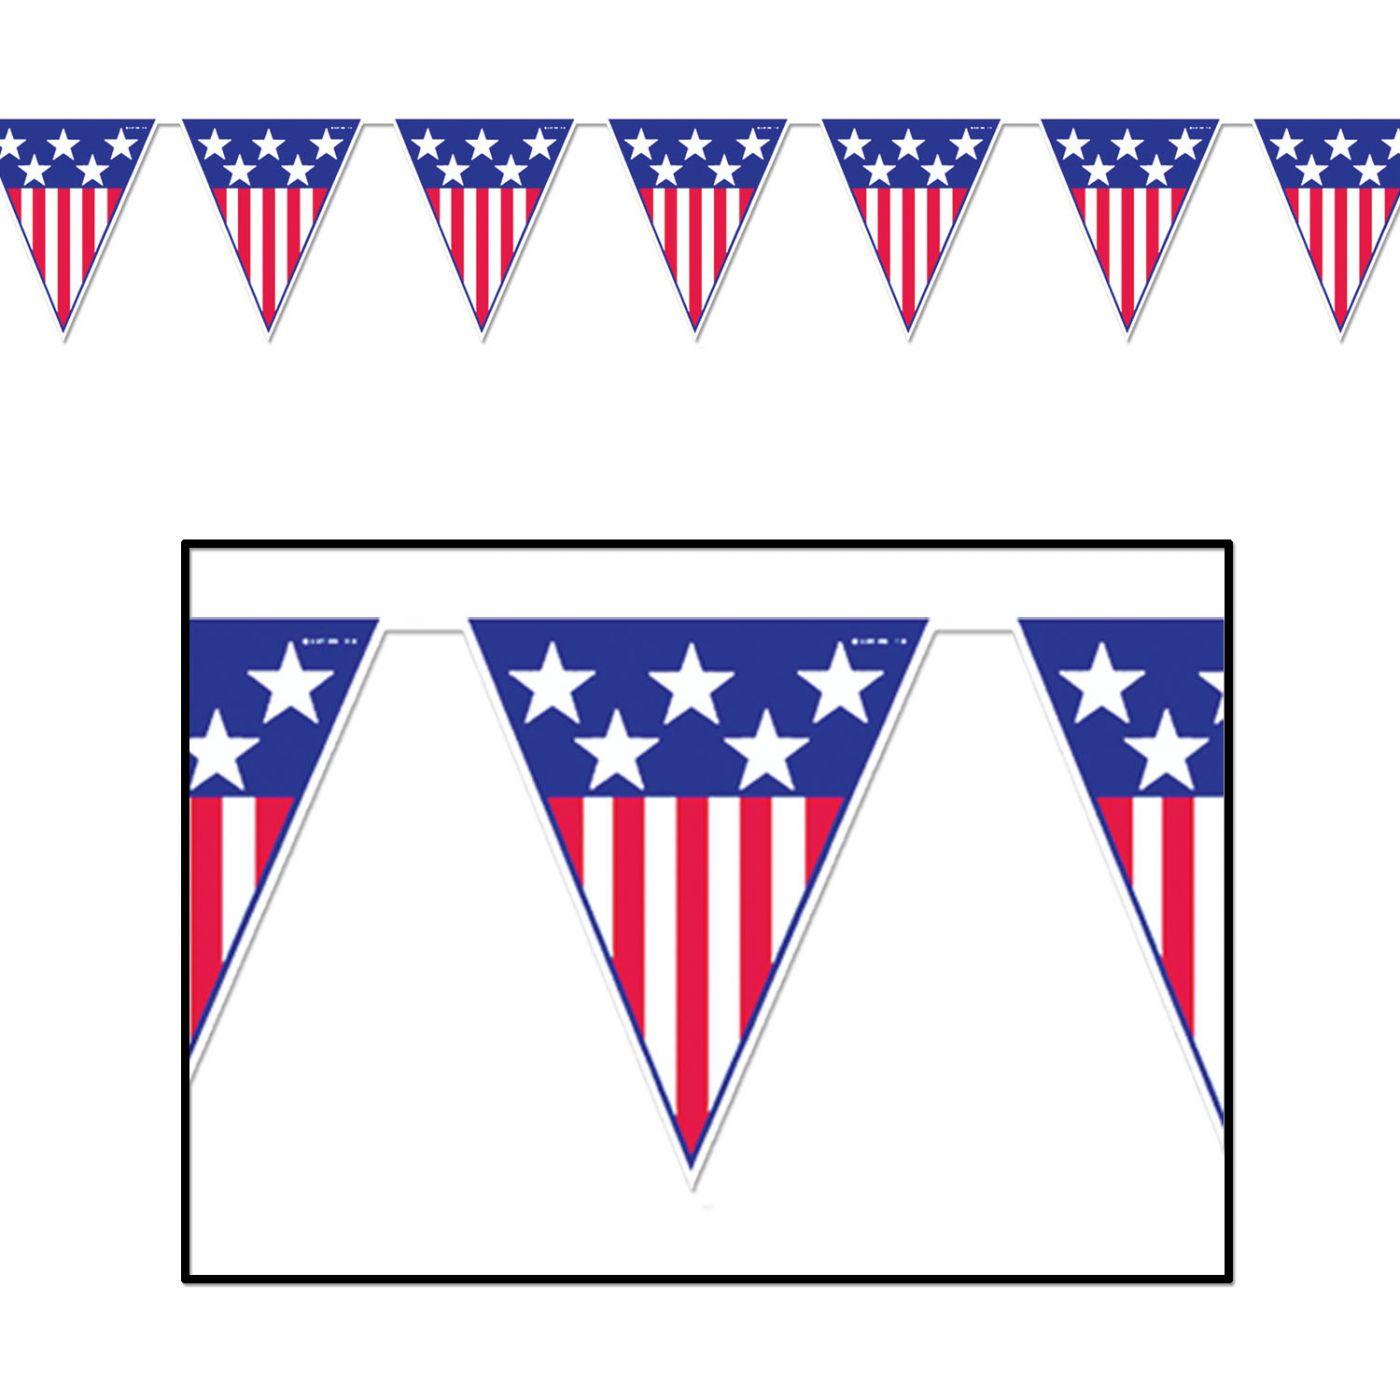 Spirit Of America Pennant Banner image